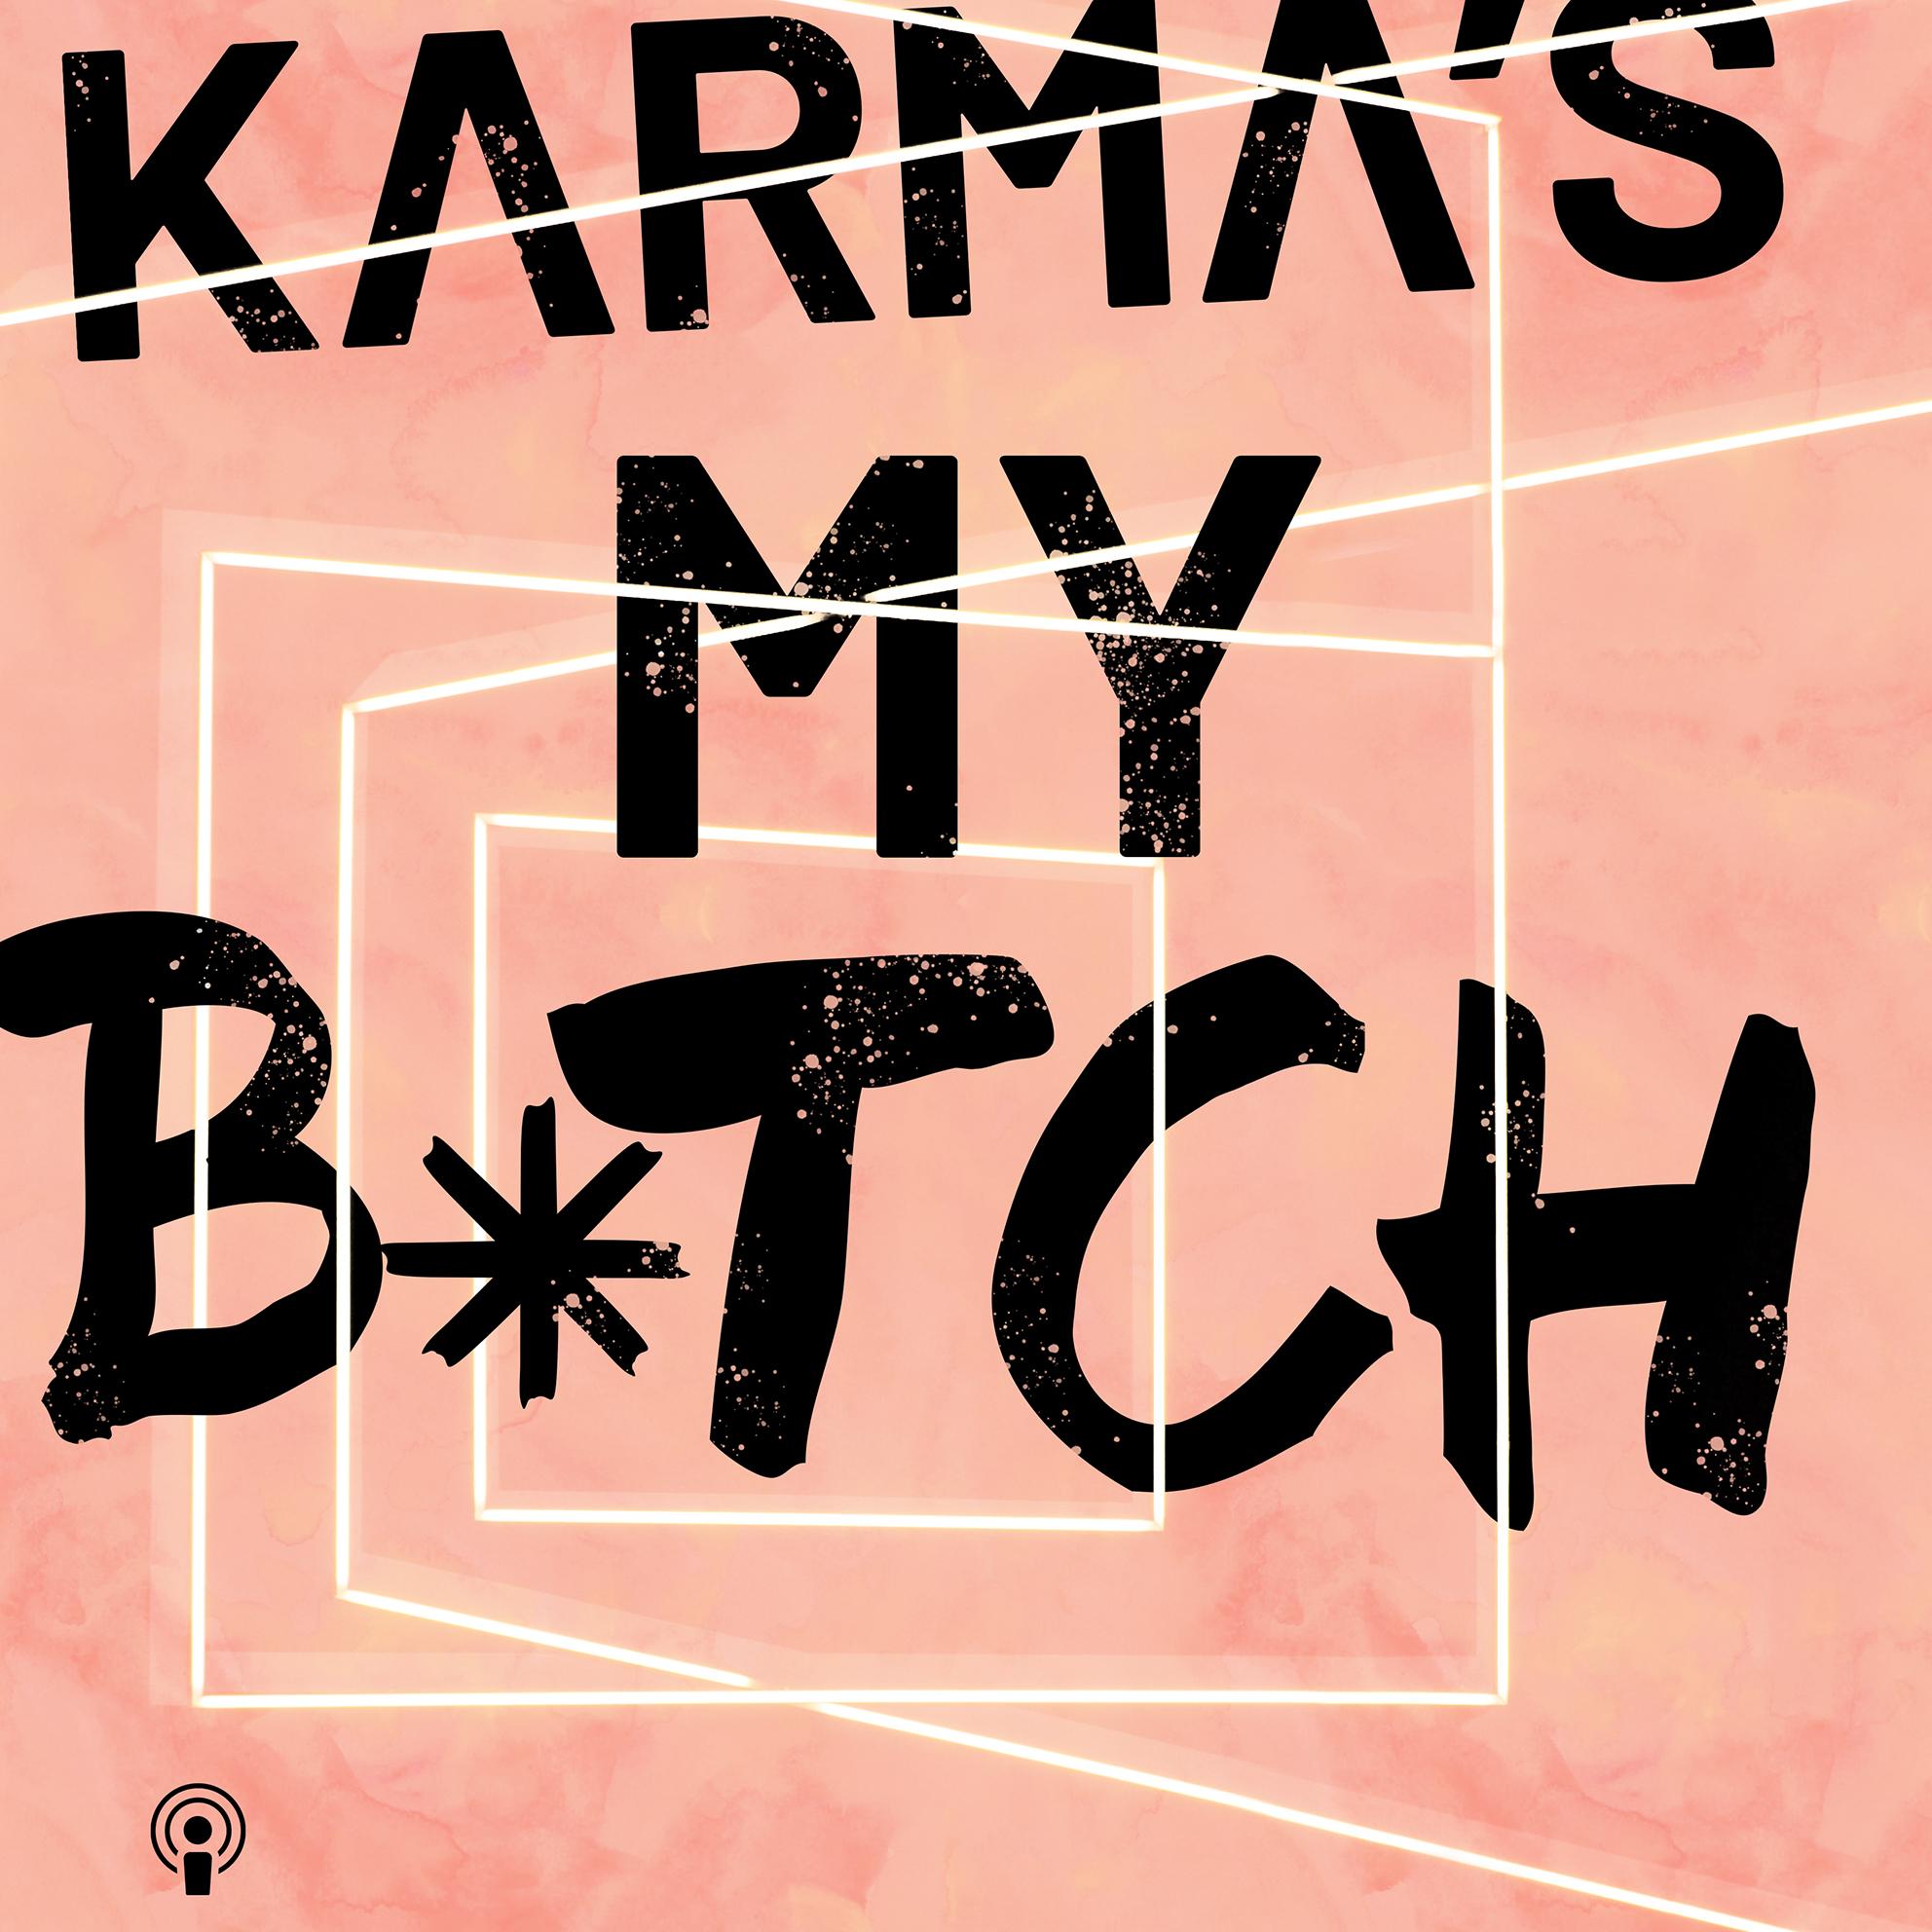 cover_karmas-my-bitch_elizabeth-hayes_small_final2.jpg